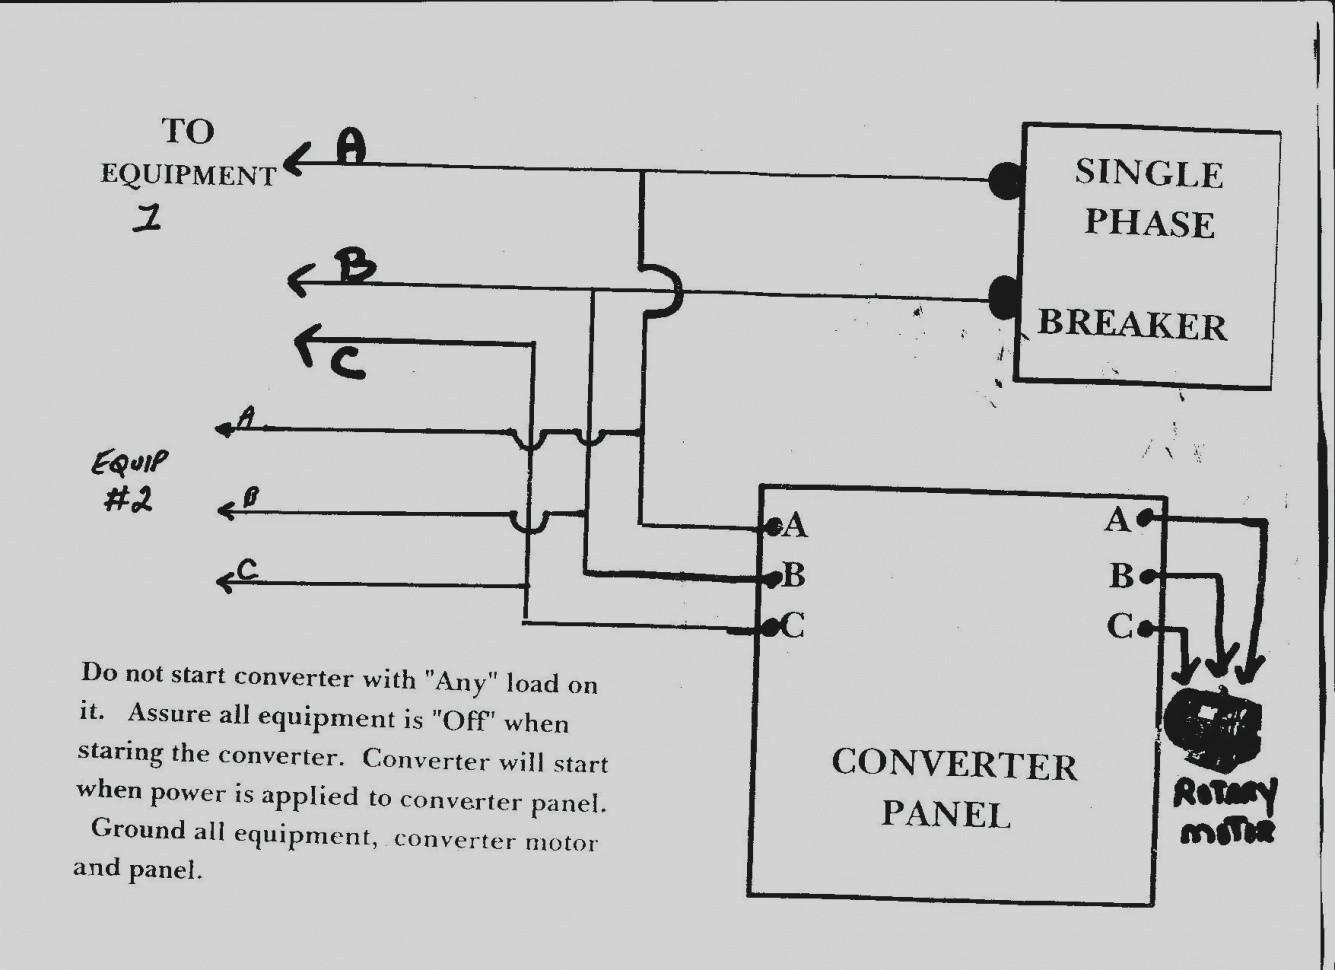 Surprising L14 20 Plug Wiring Diagram New L6 30 30P 30R L15 With Techteazer Com Wiring Cloud Unhoicandsaprexeroixtuhyedimohammedshrineorg